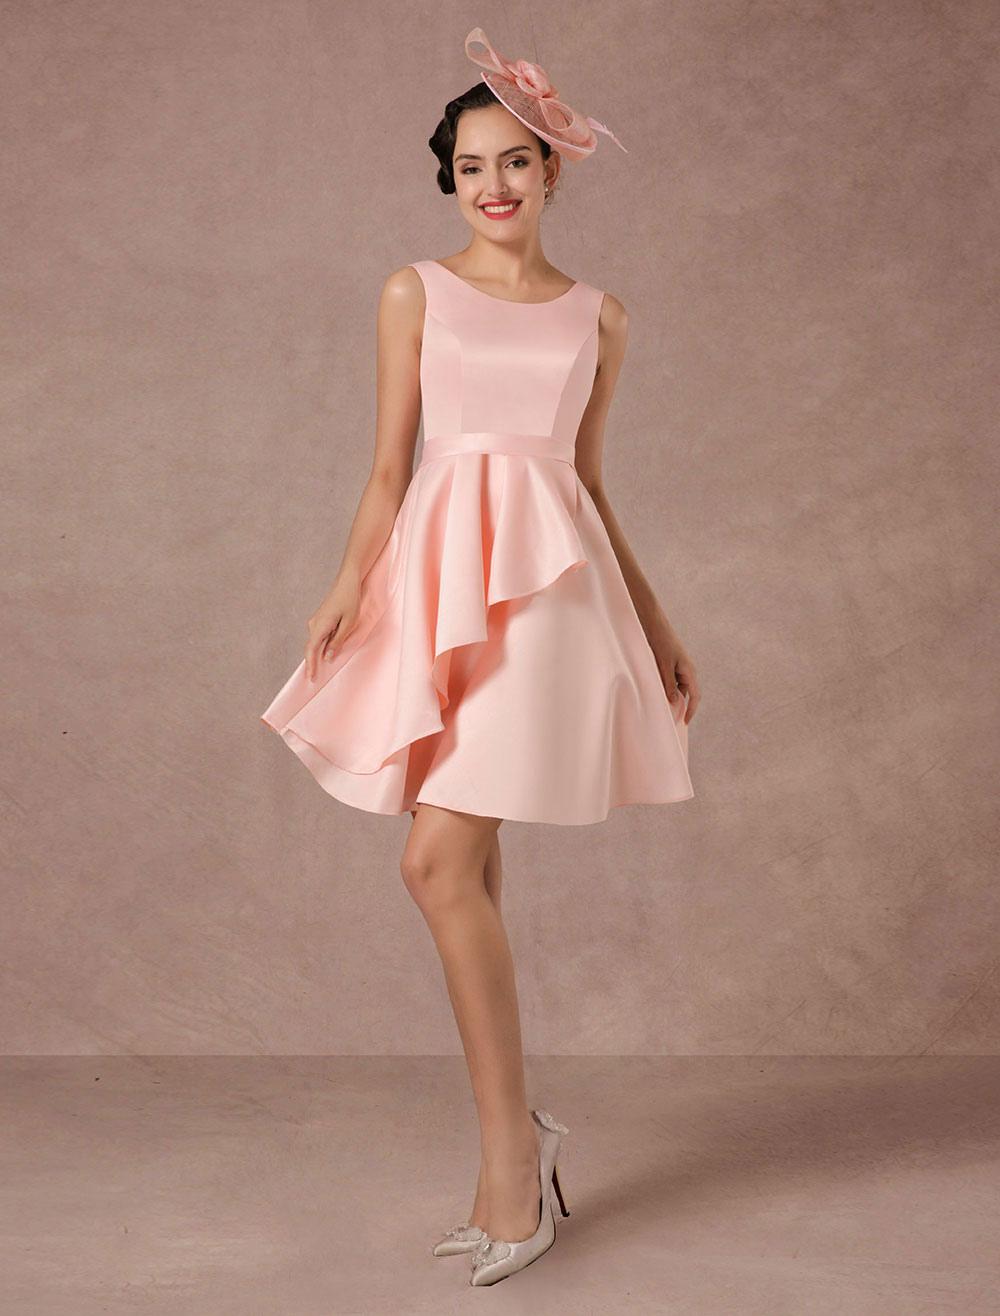 Pink Wedding Dress Short Vintage Summer Wedding Dresses 2018 Asymmetrical Train Cocktail Dress photo